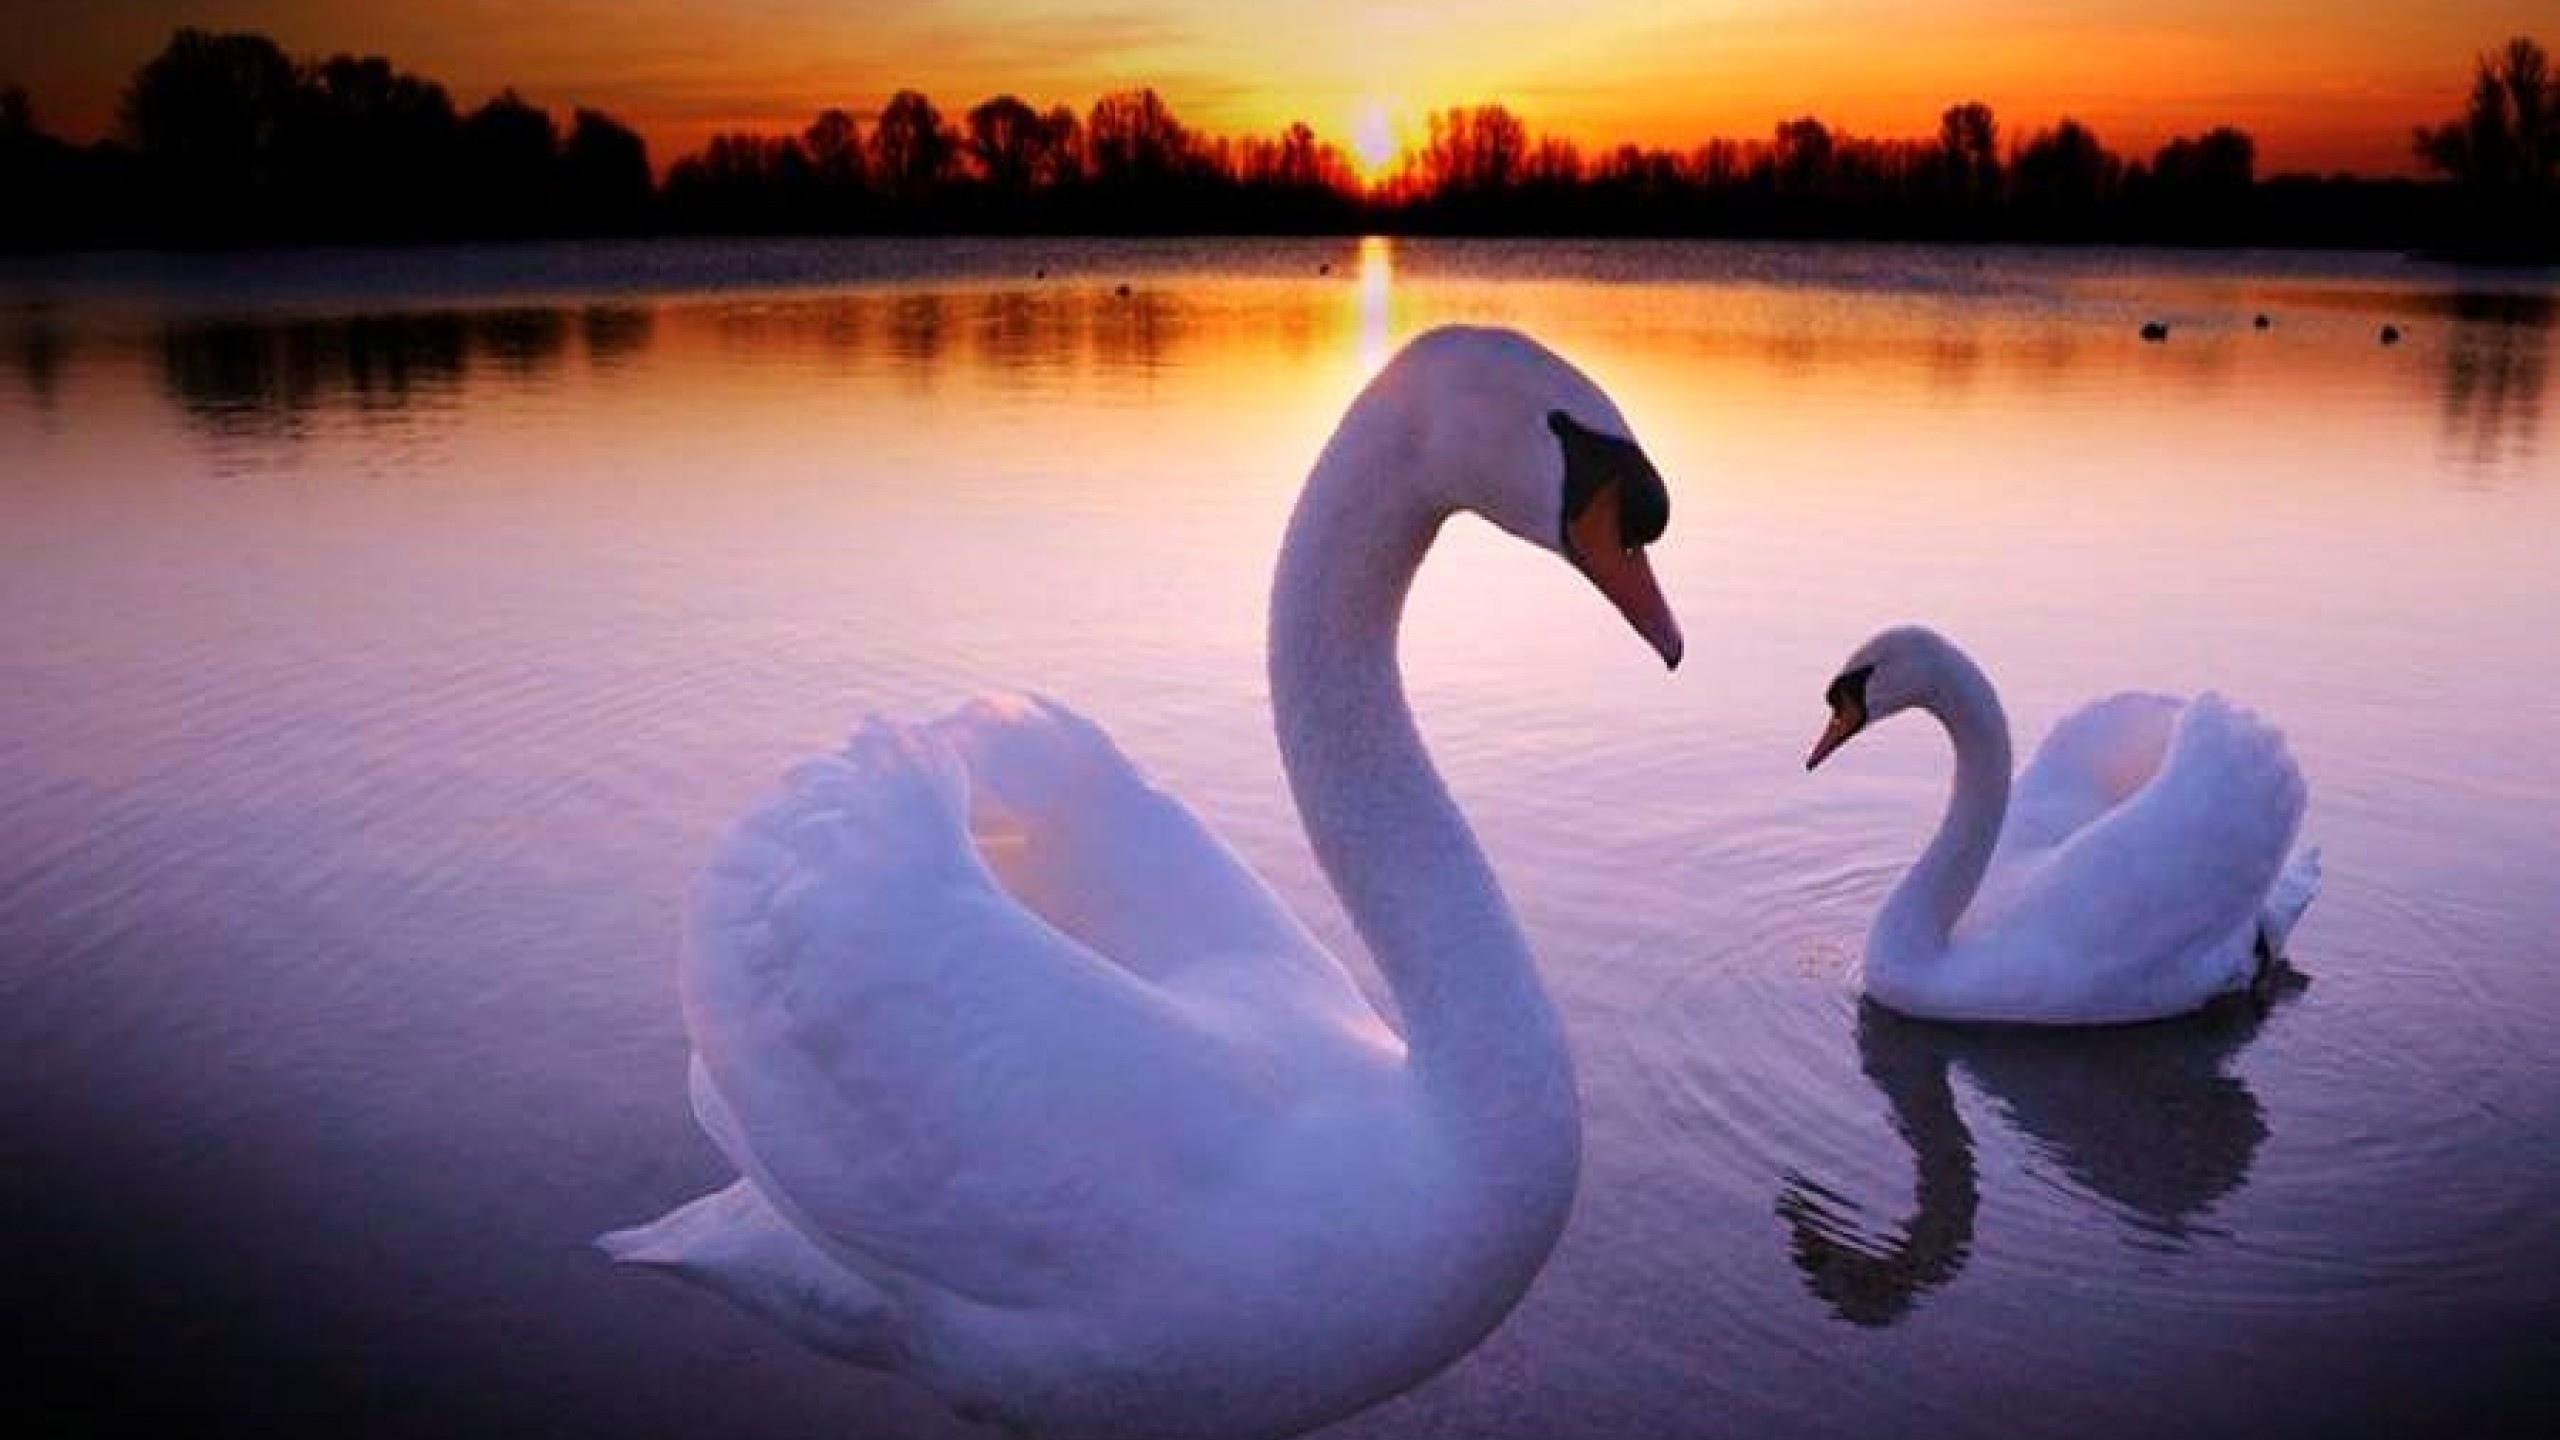 Swans web photos on pinterest 24 pins - Swan wallpapers for desktop ...